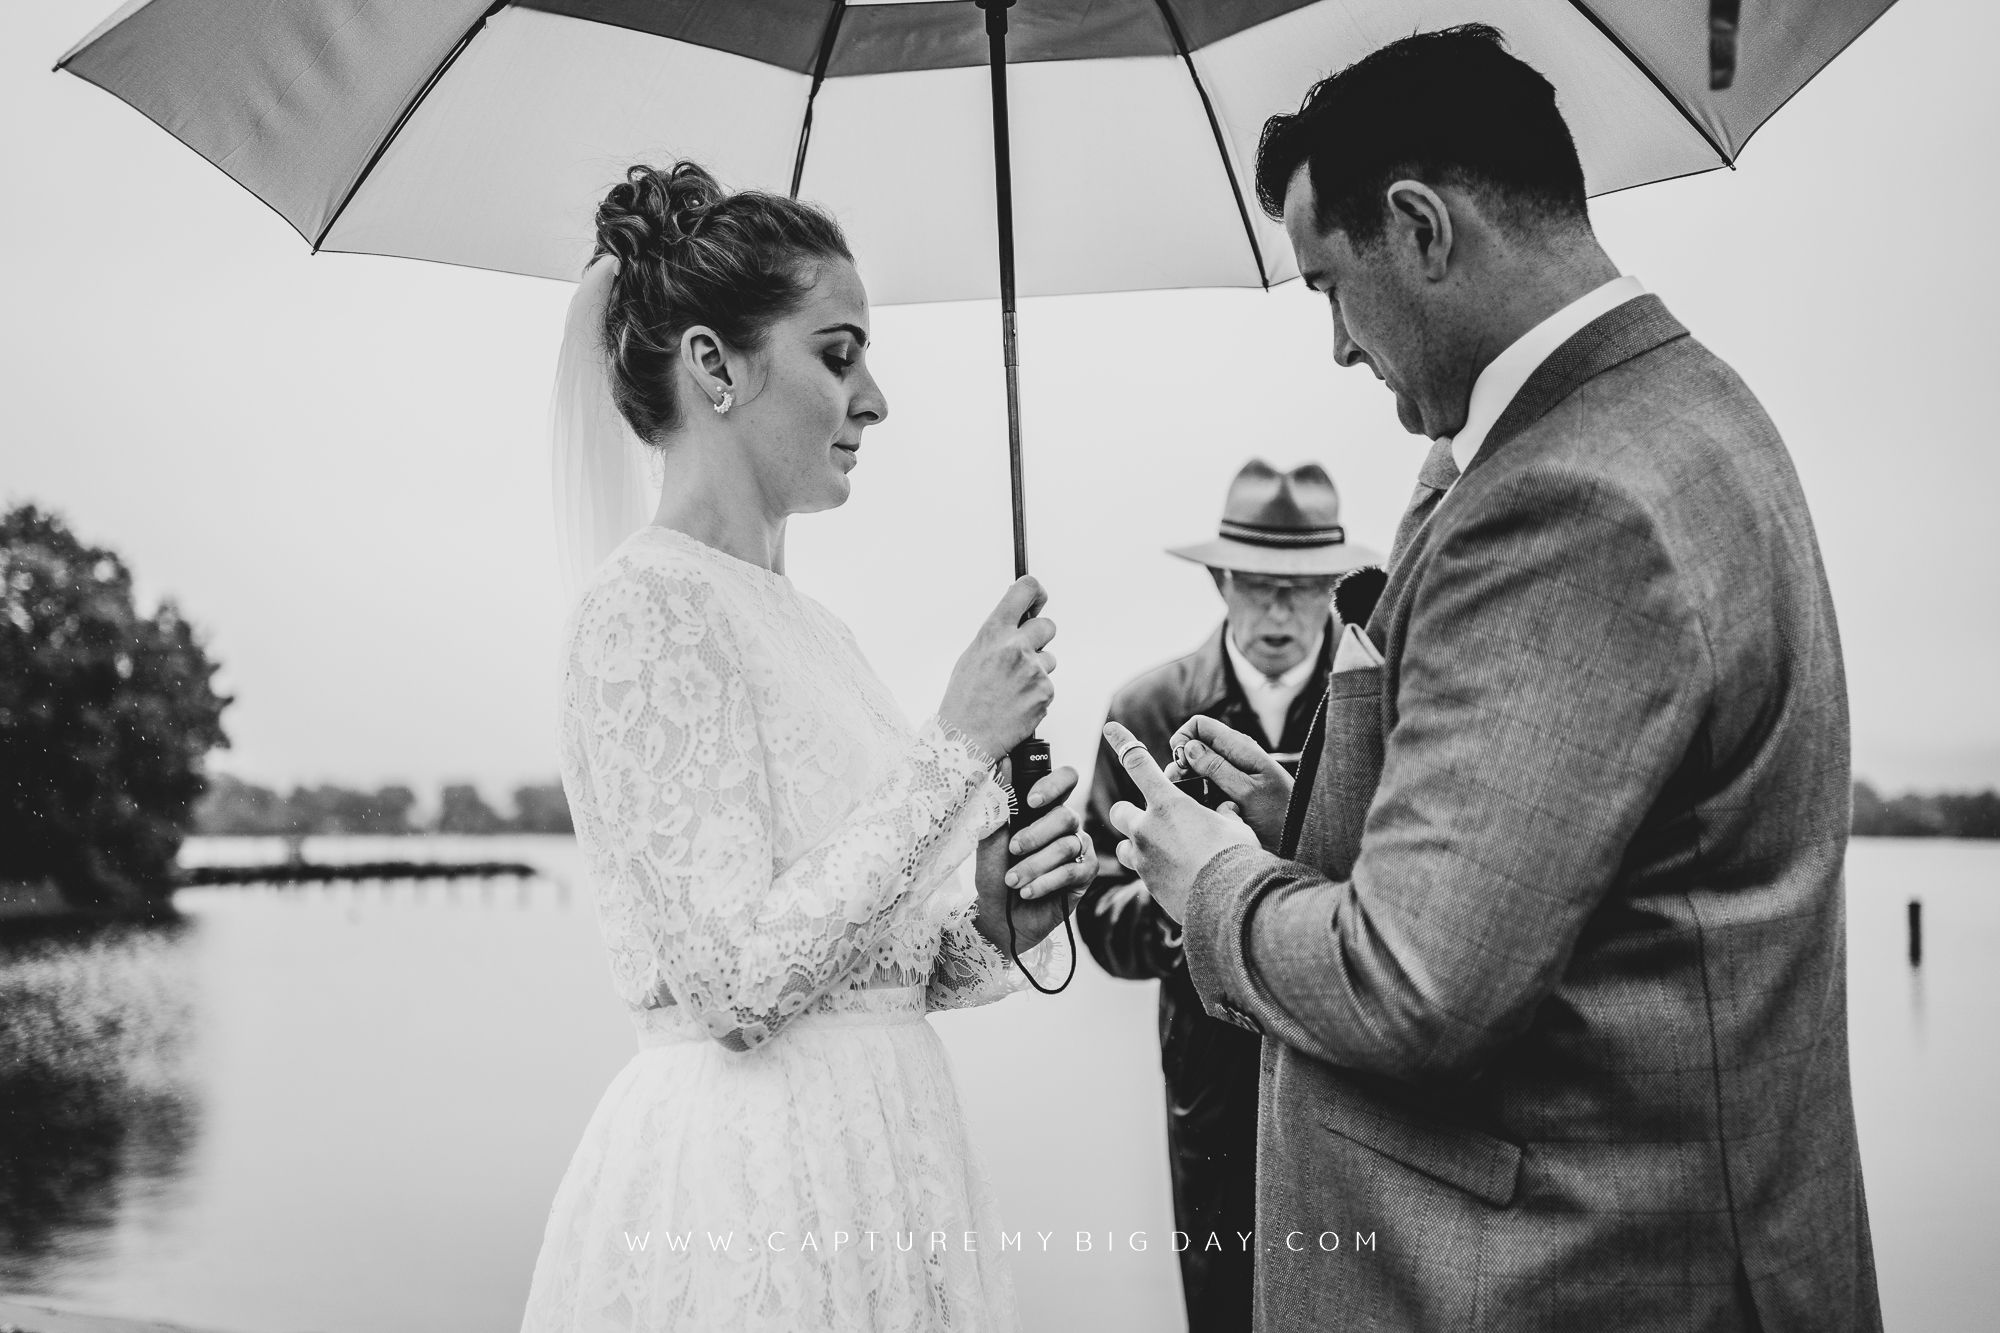 wedding vows at the beach in northern Ireland